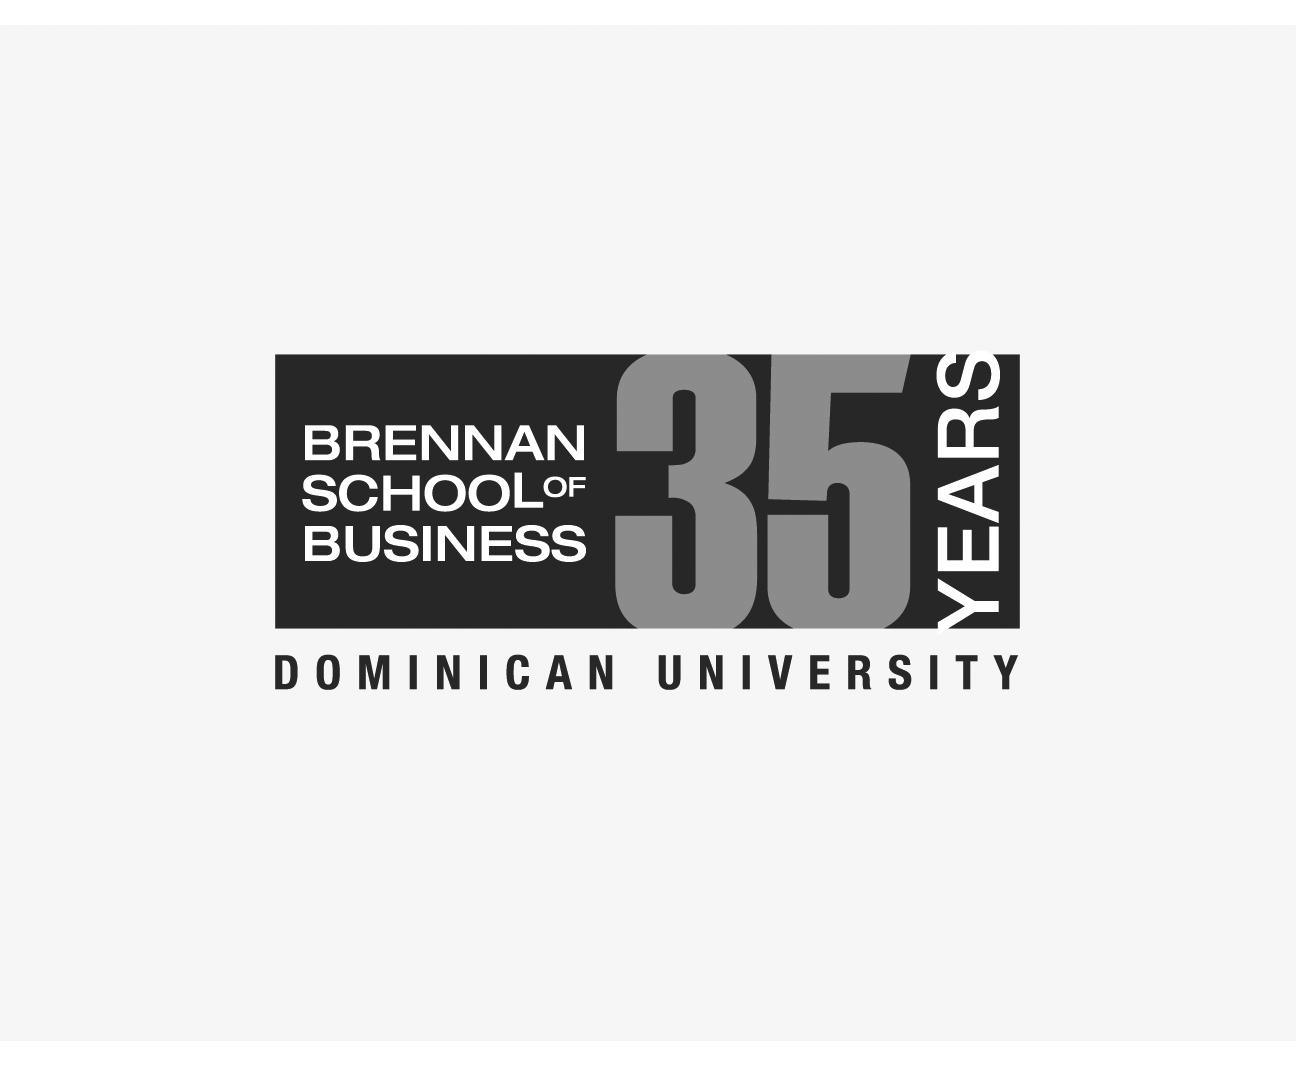 logo_bsb_35_gs.jpg